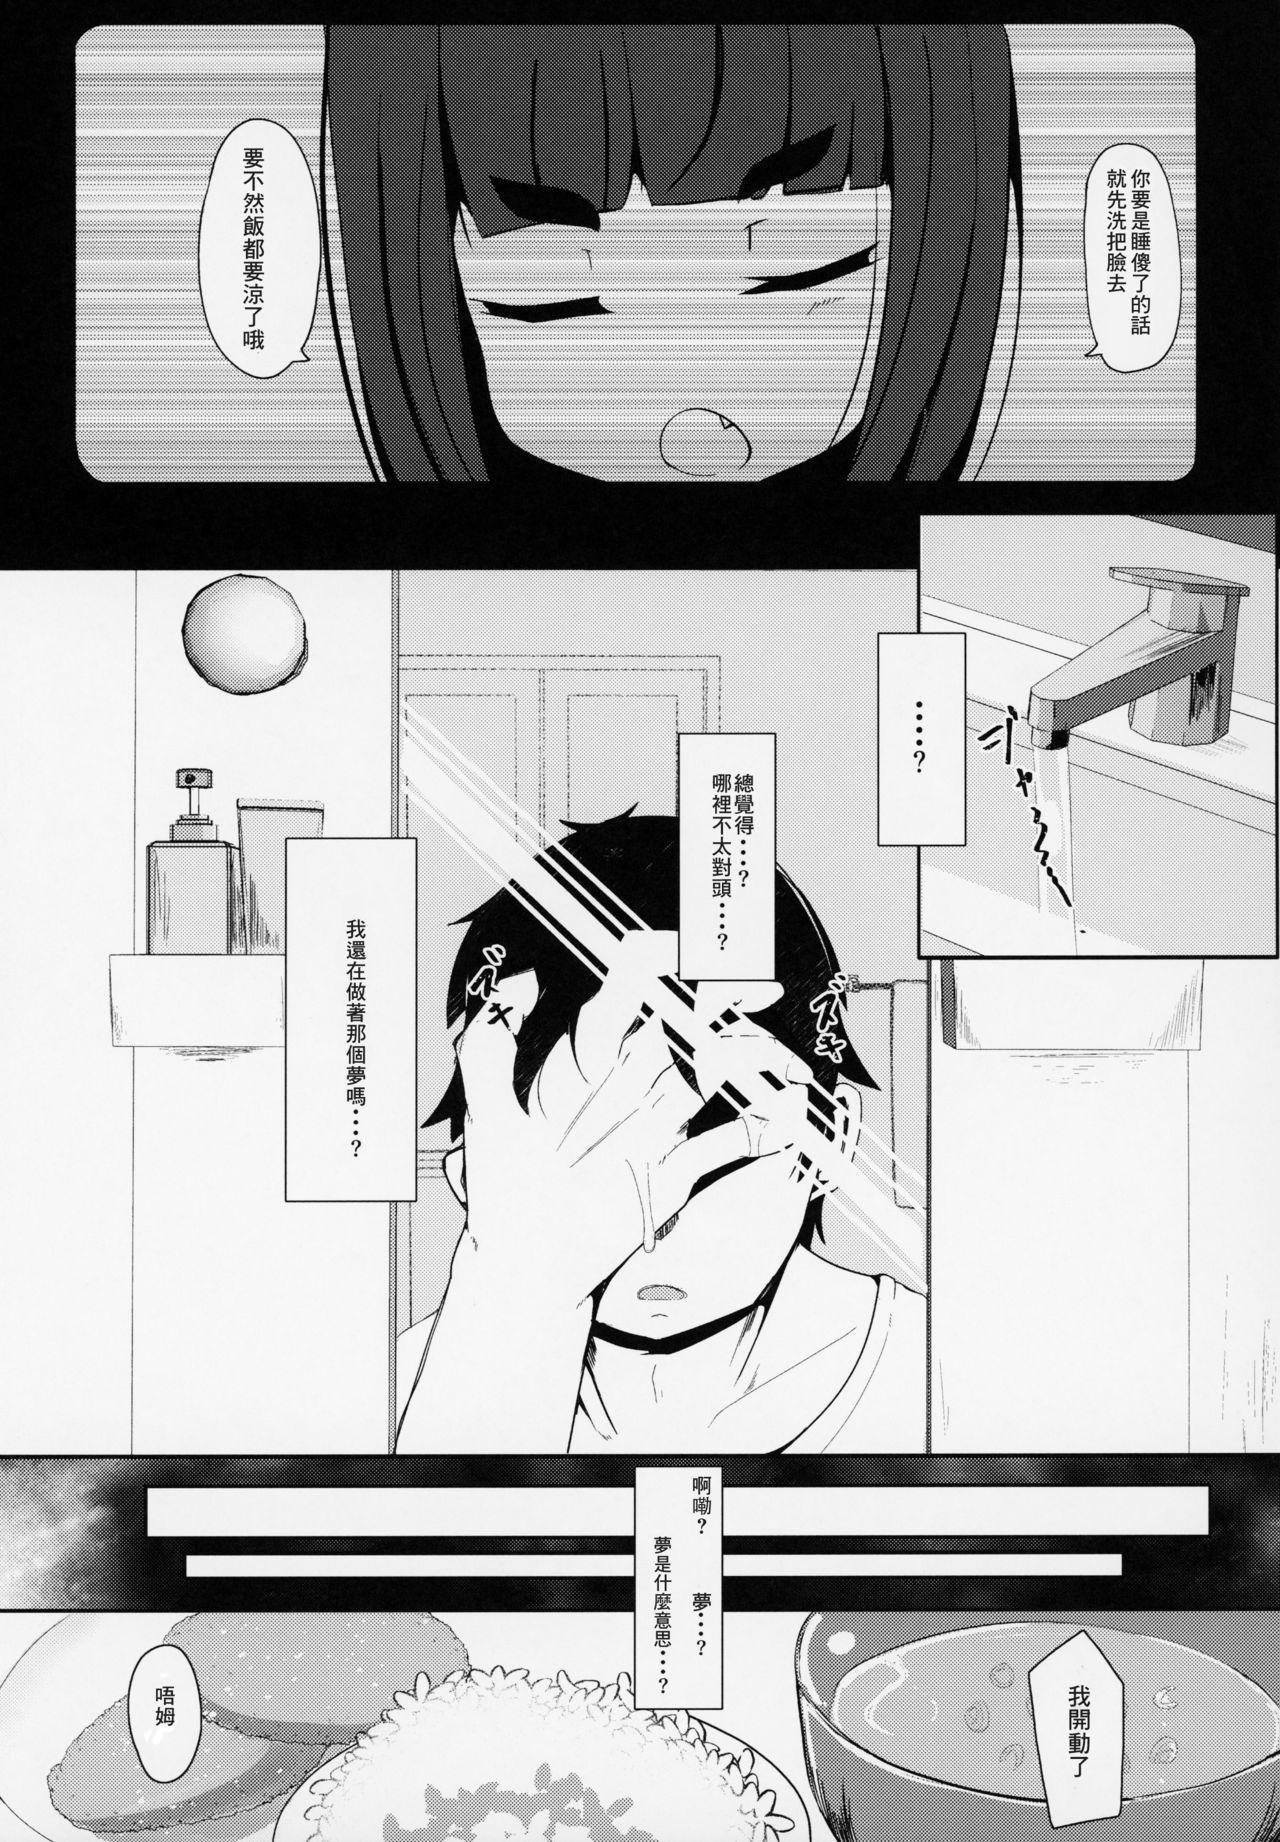 (COMITIA127) [Manpuchi (Nekodel)] Uro -Makuai- Kanwa [Chinese] [零食汉化组] 8